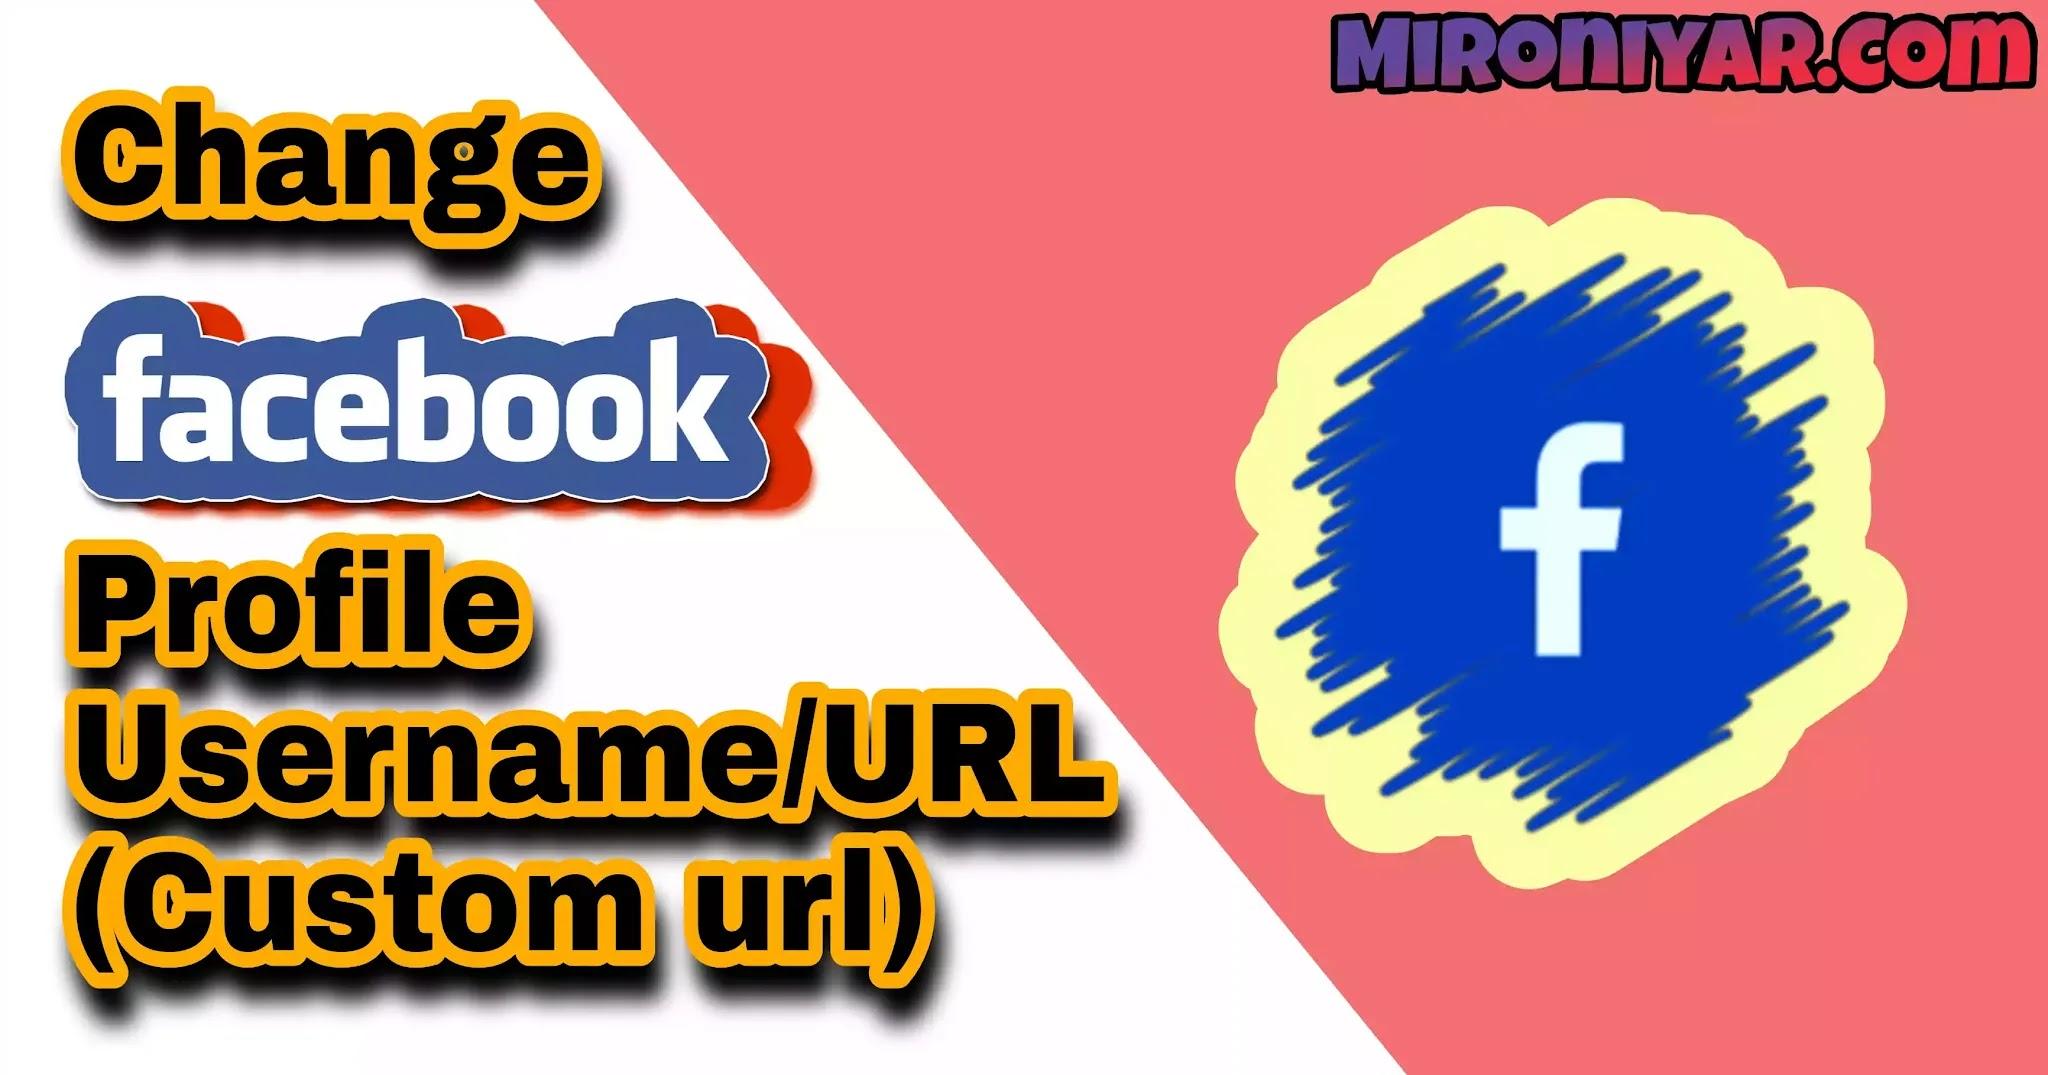 How to Change Facebook Profile Username/URL (Custom url)